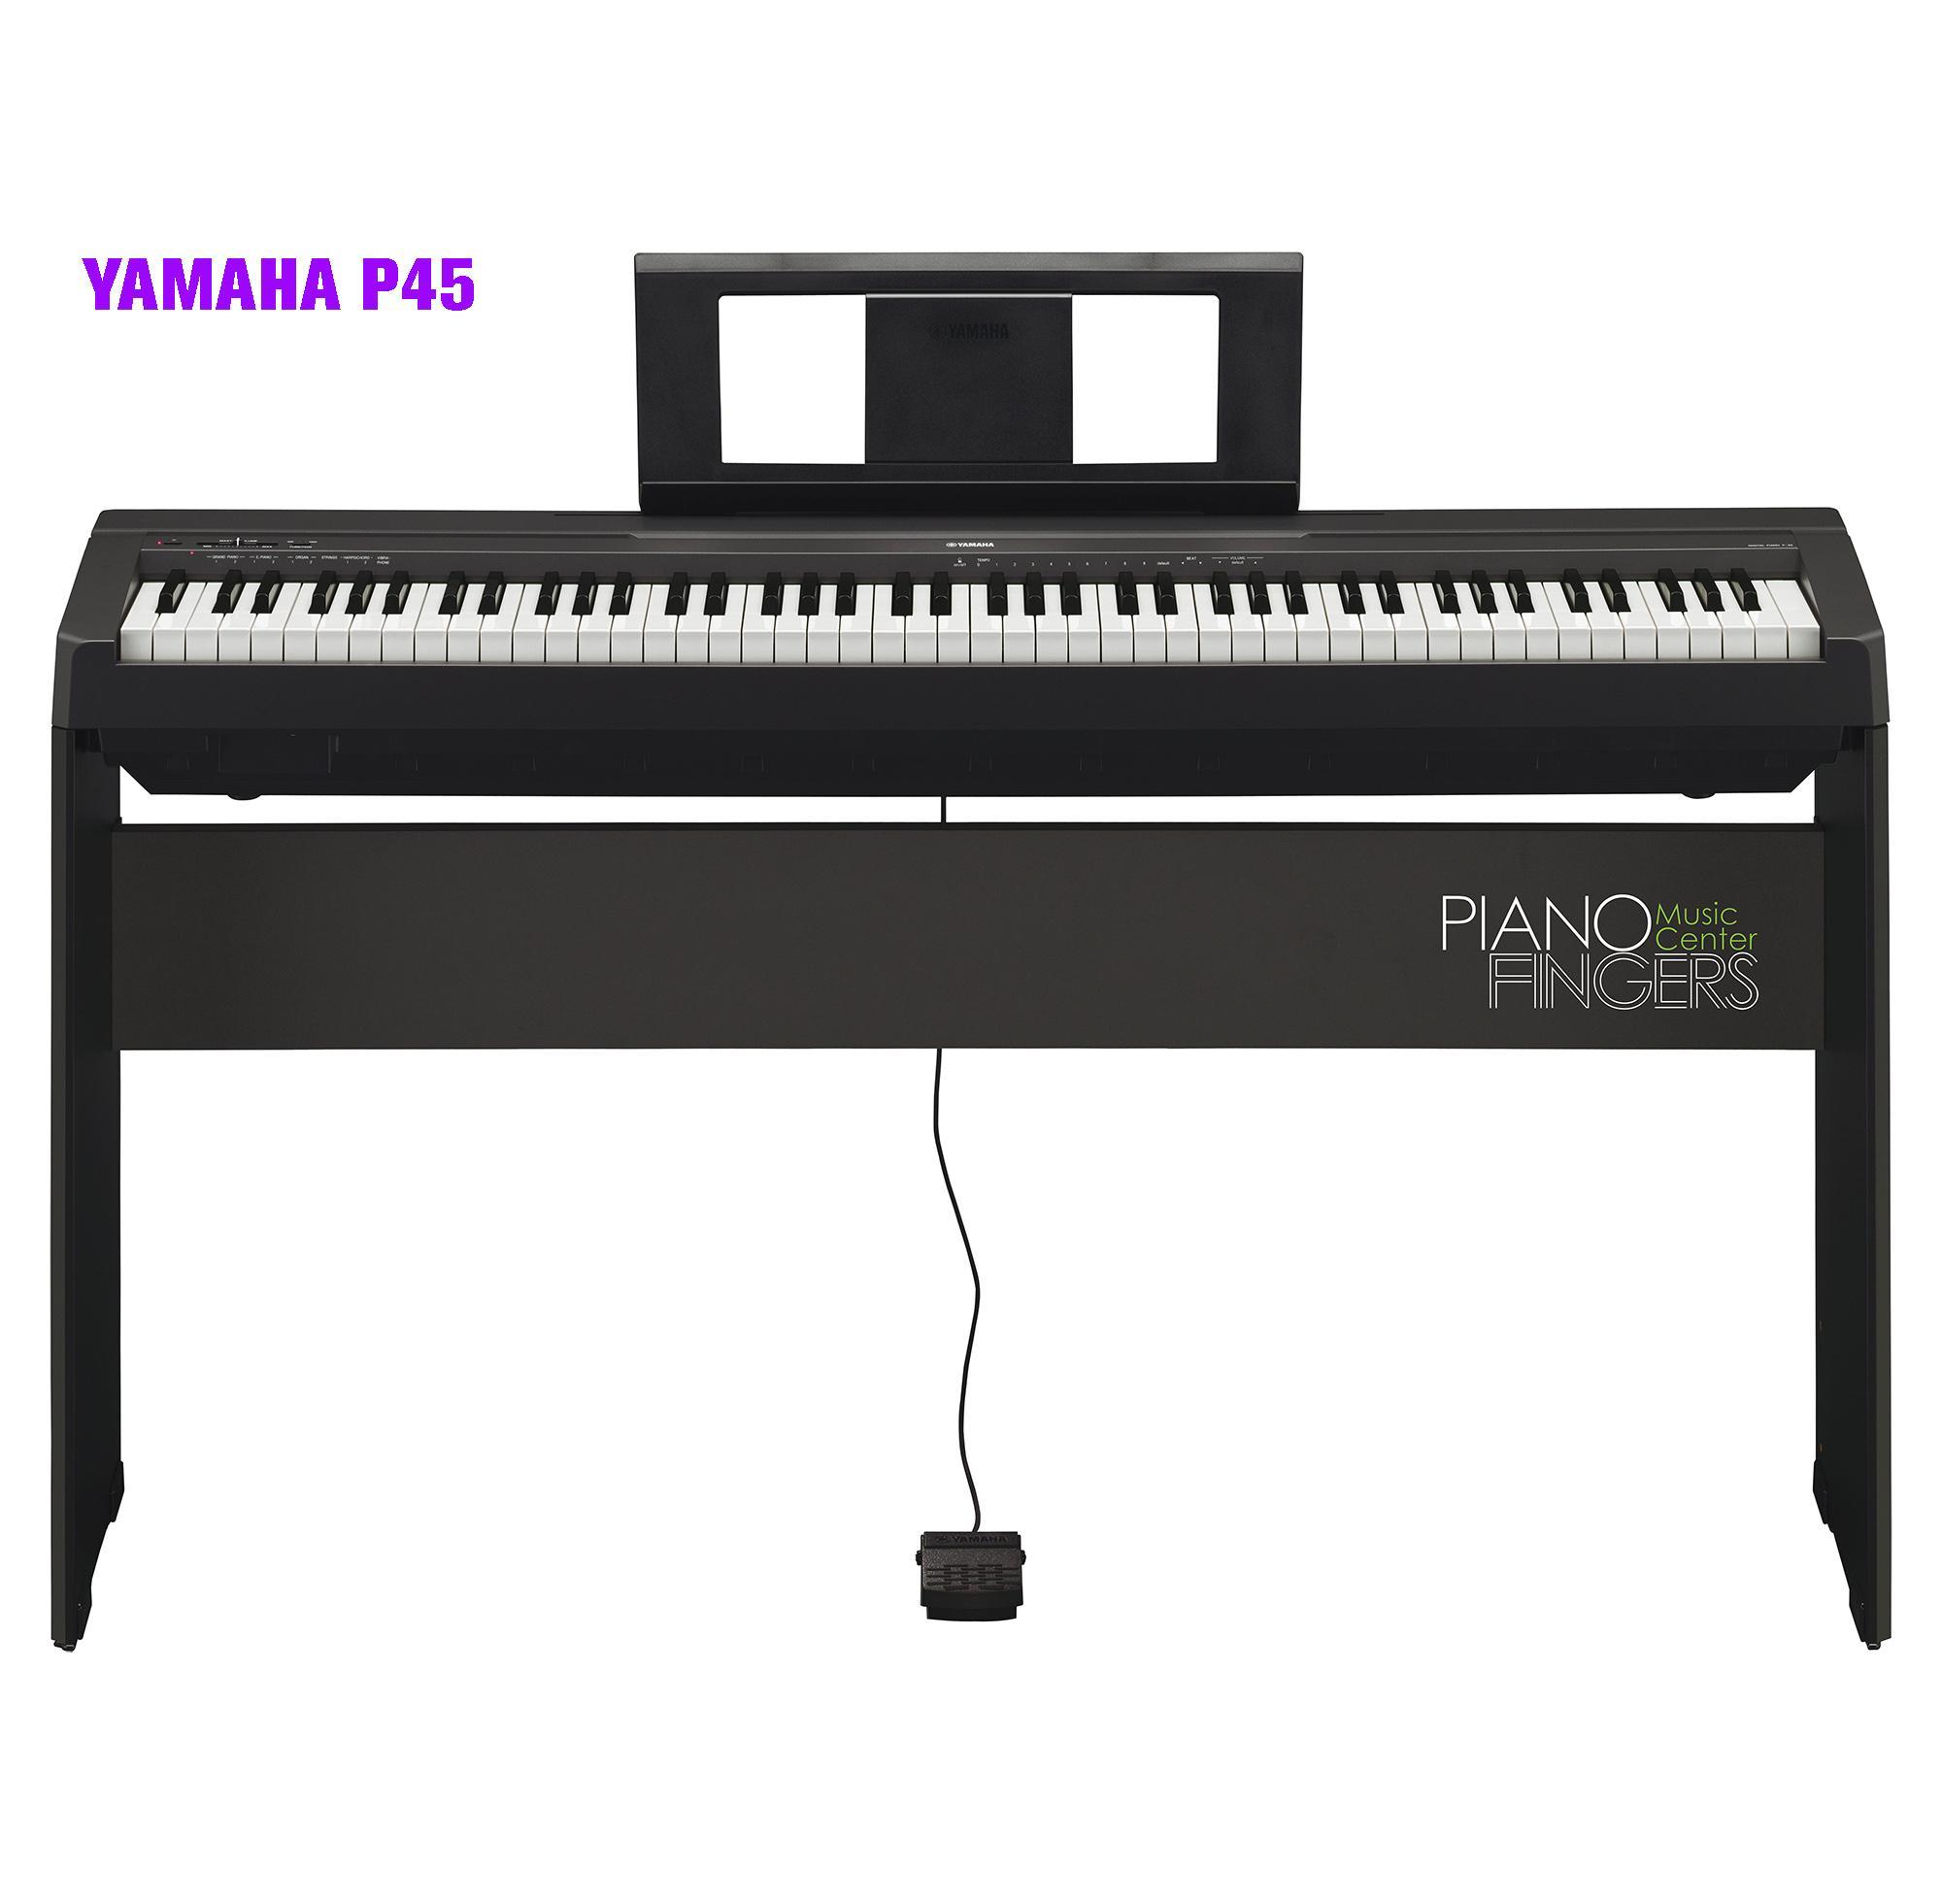 Digital piano Yamaha P45+L85 - Piano Fingers